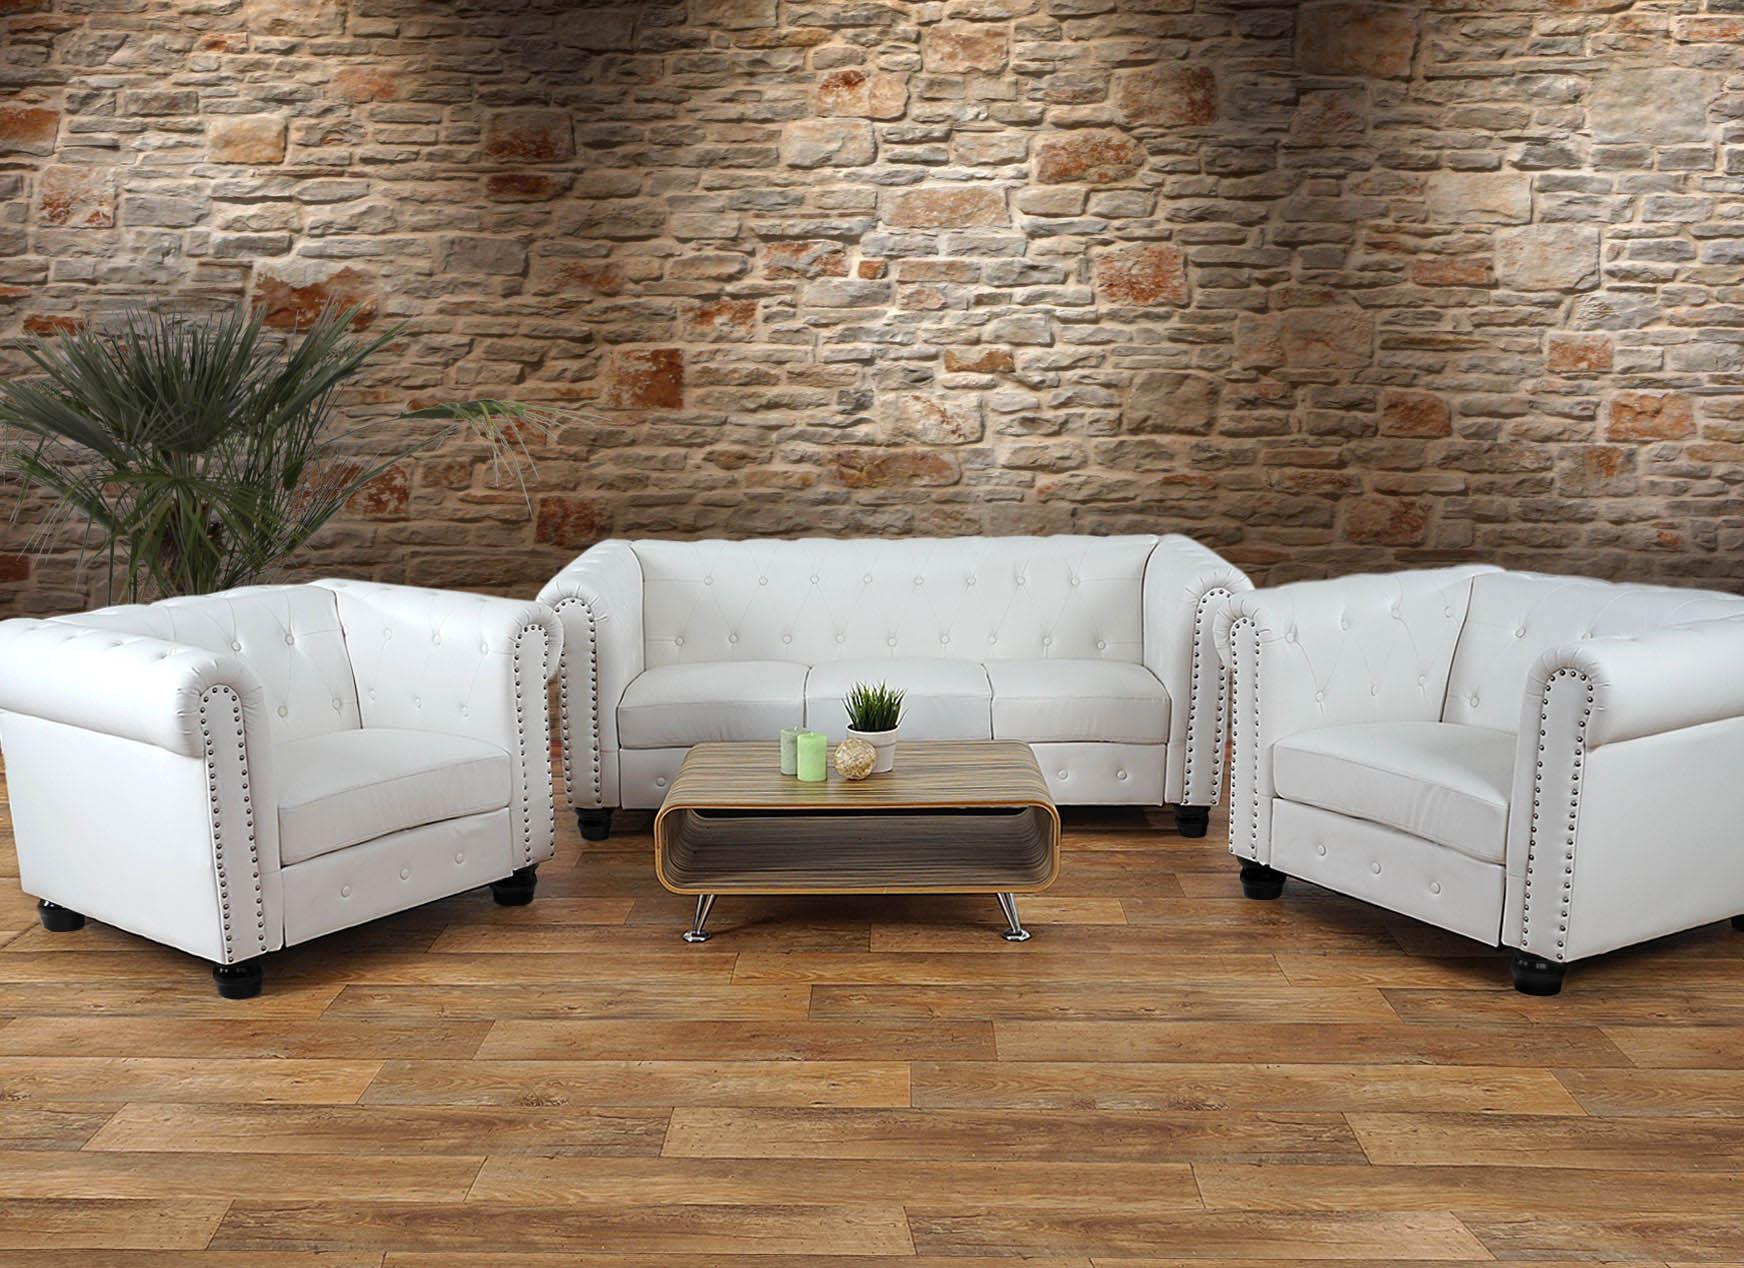 luxus 3 1 1 sofagarnitur chesterfield couch kunstleder. Black Bedroom Furniture Sets. Home Design Ideas